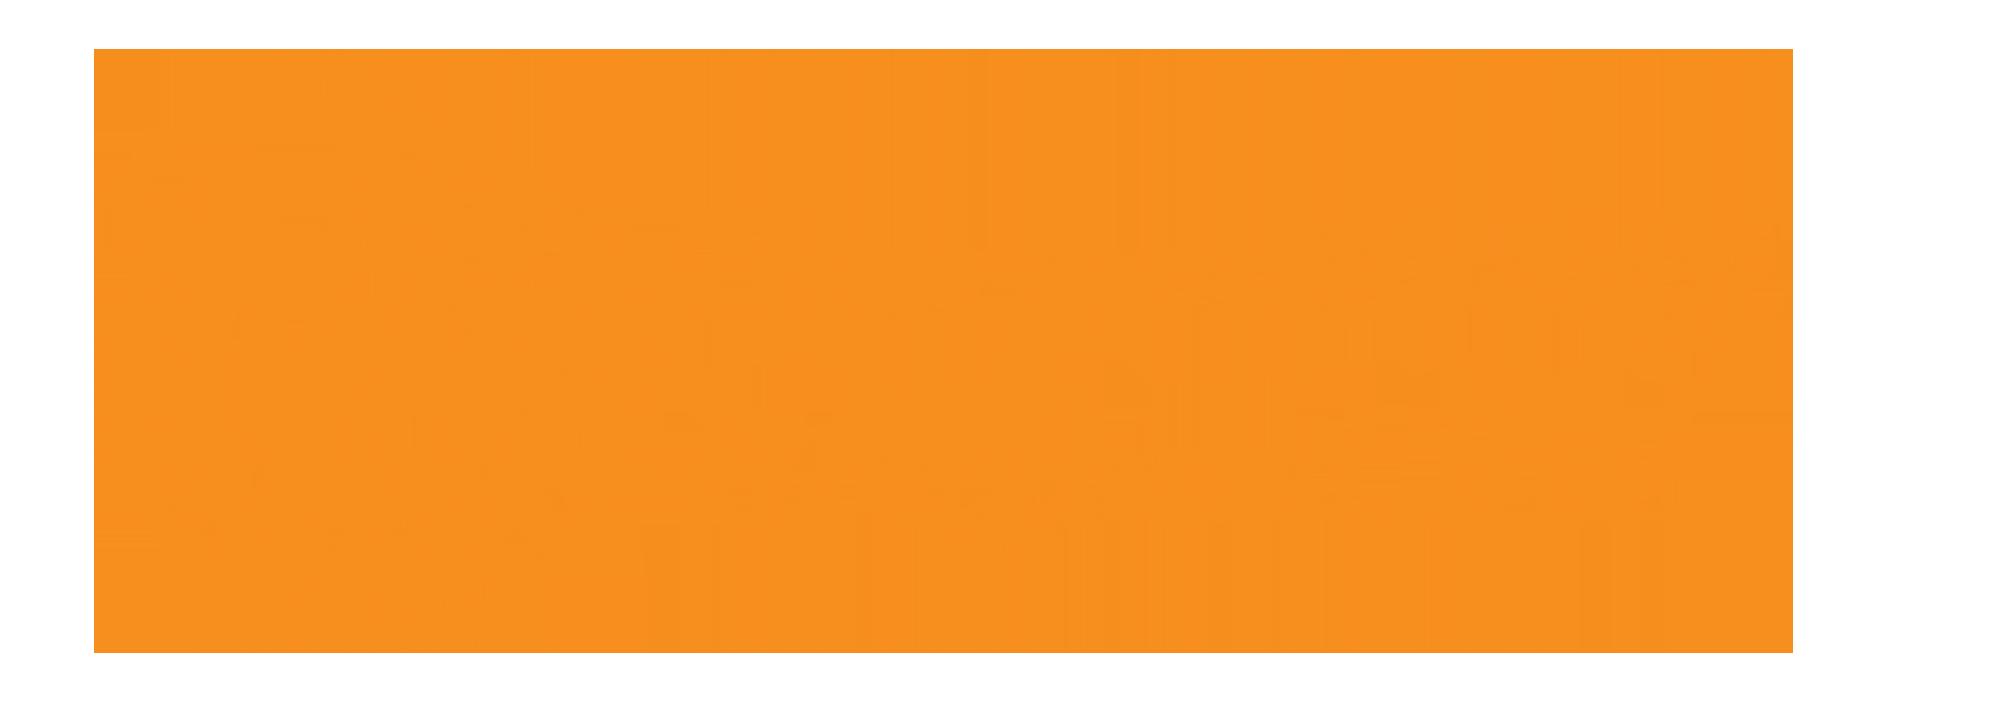 http://www.transportbedrijfhoogland.nl/wp-content/uploads/2019/11/logo_big.png